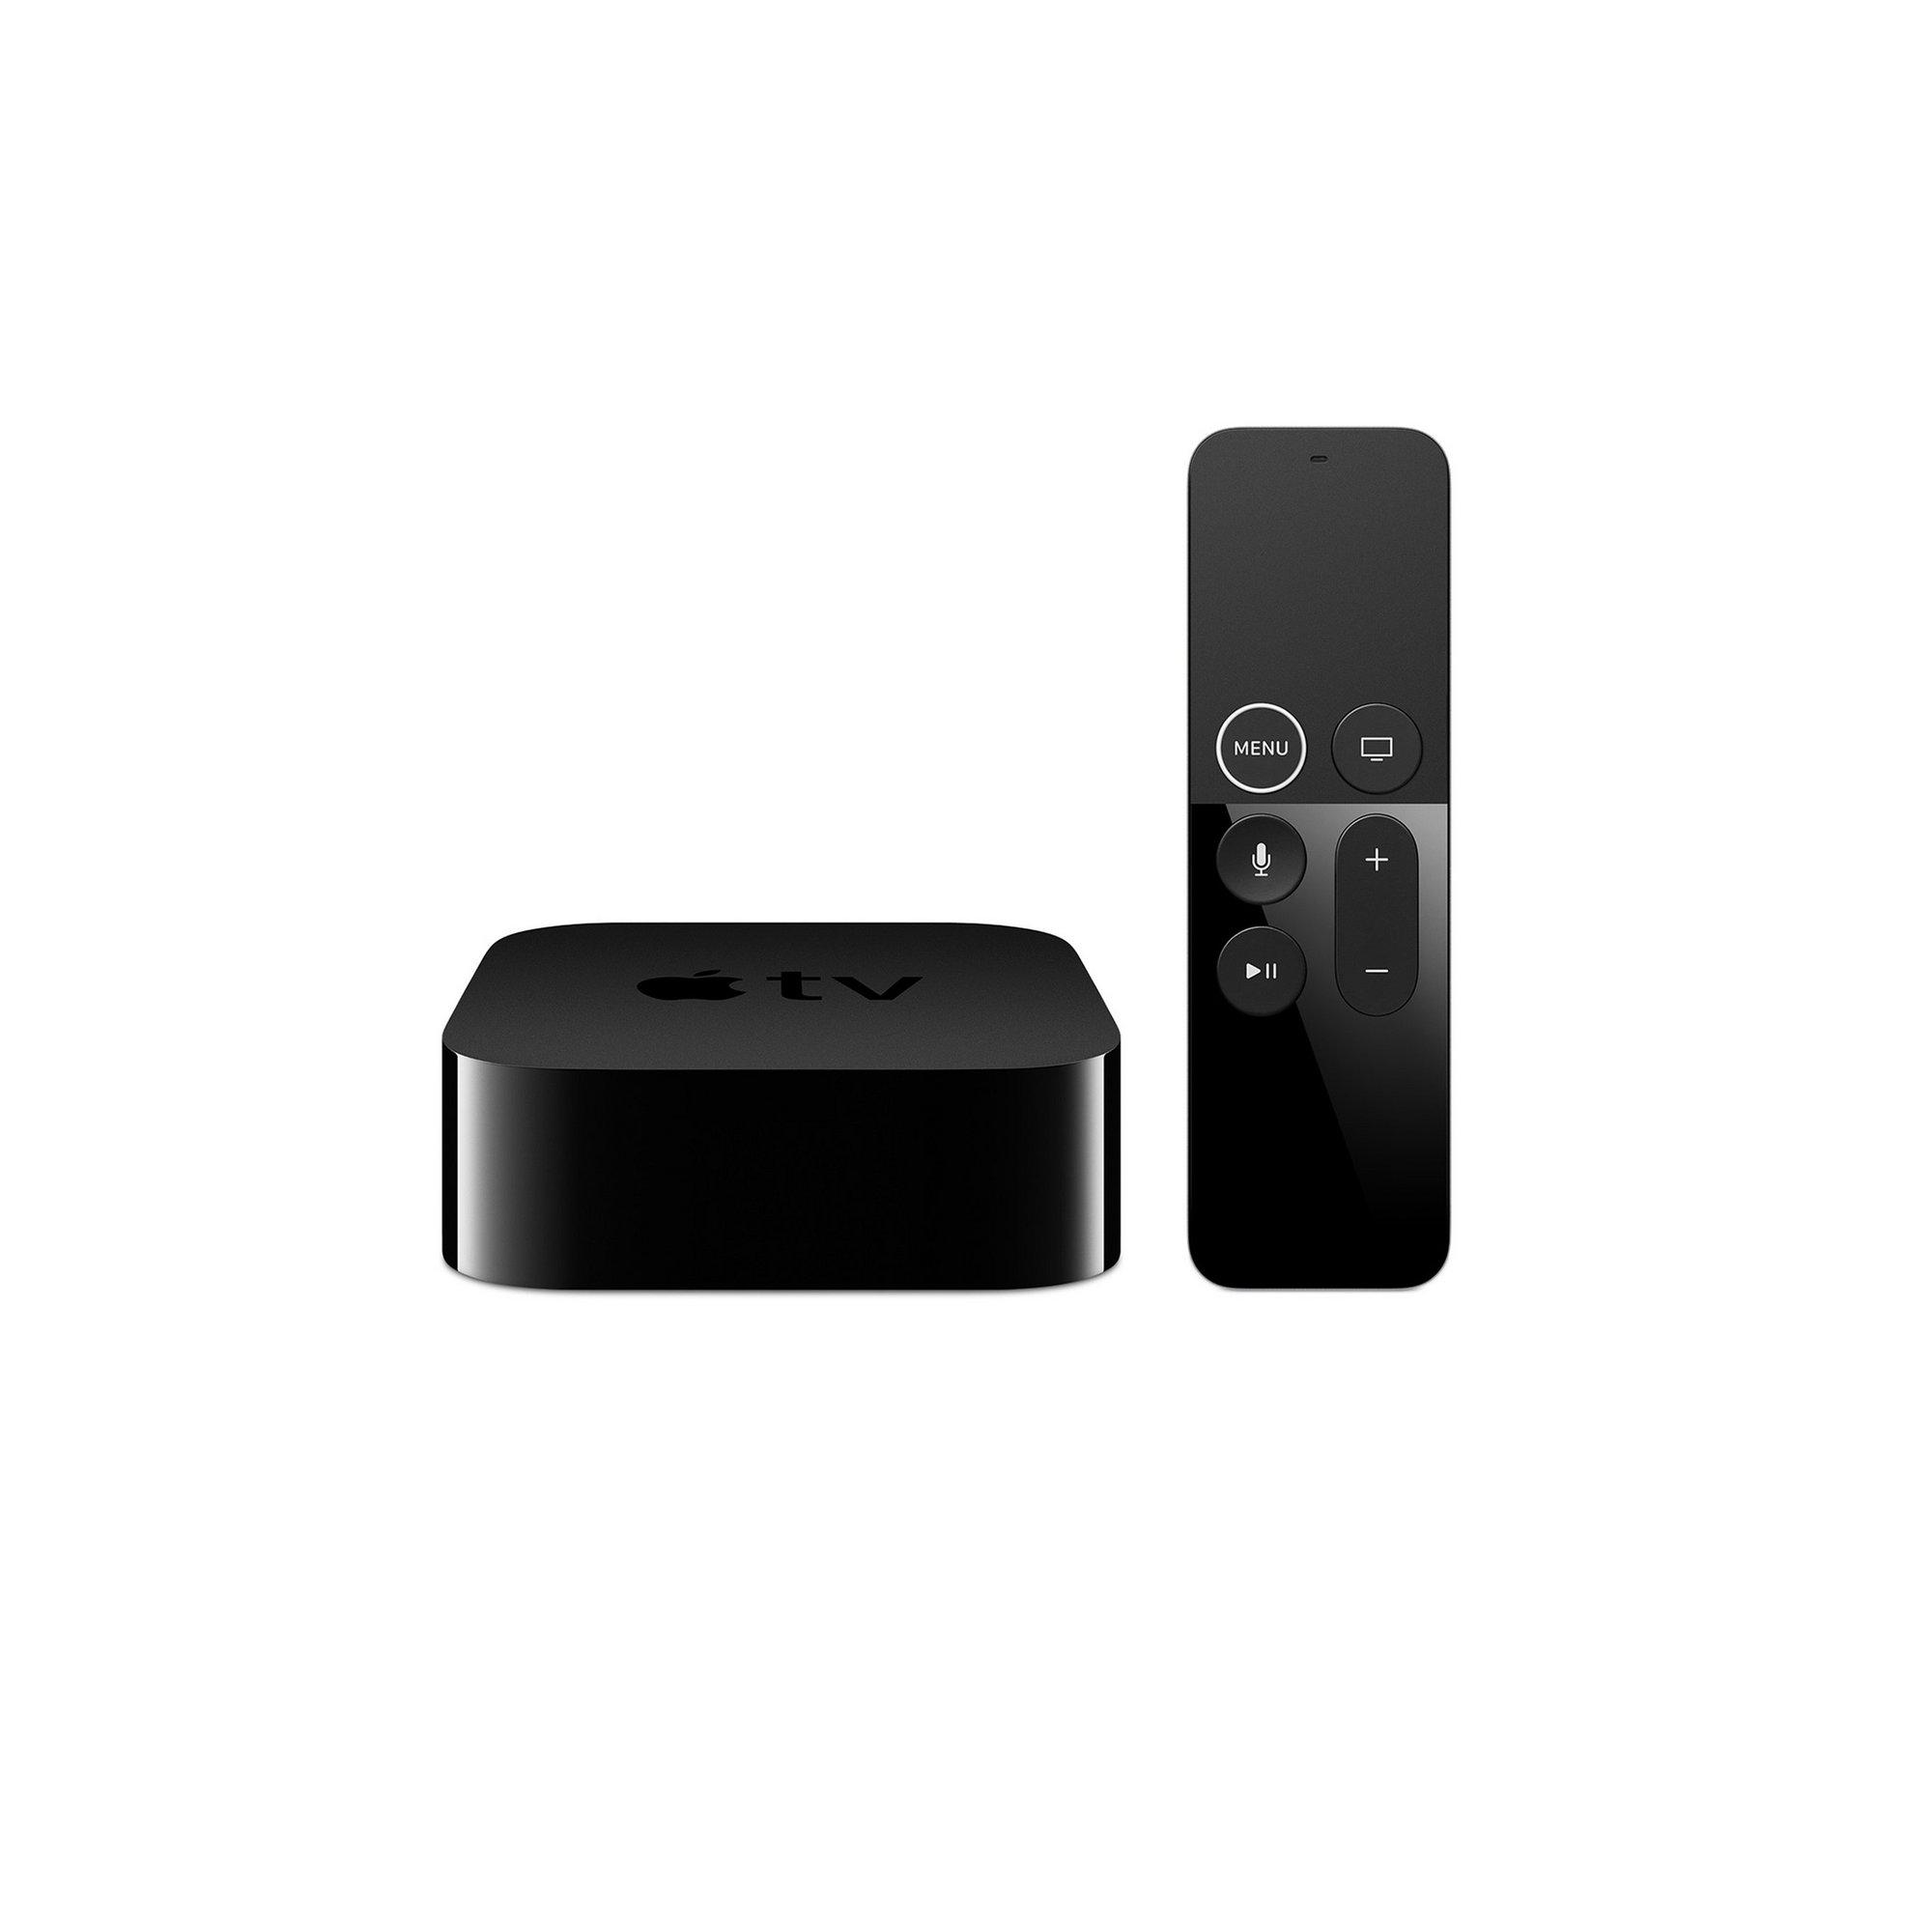 Image of Apple TV 4K